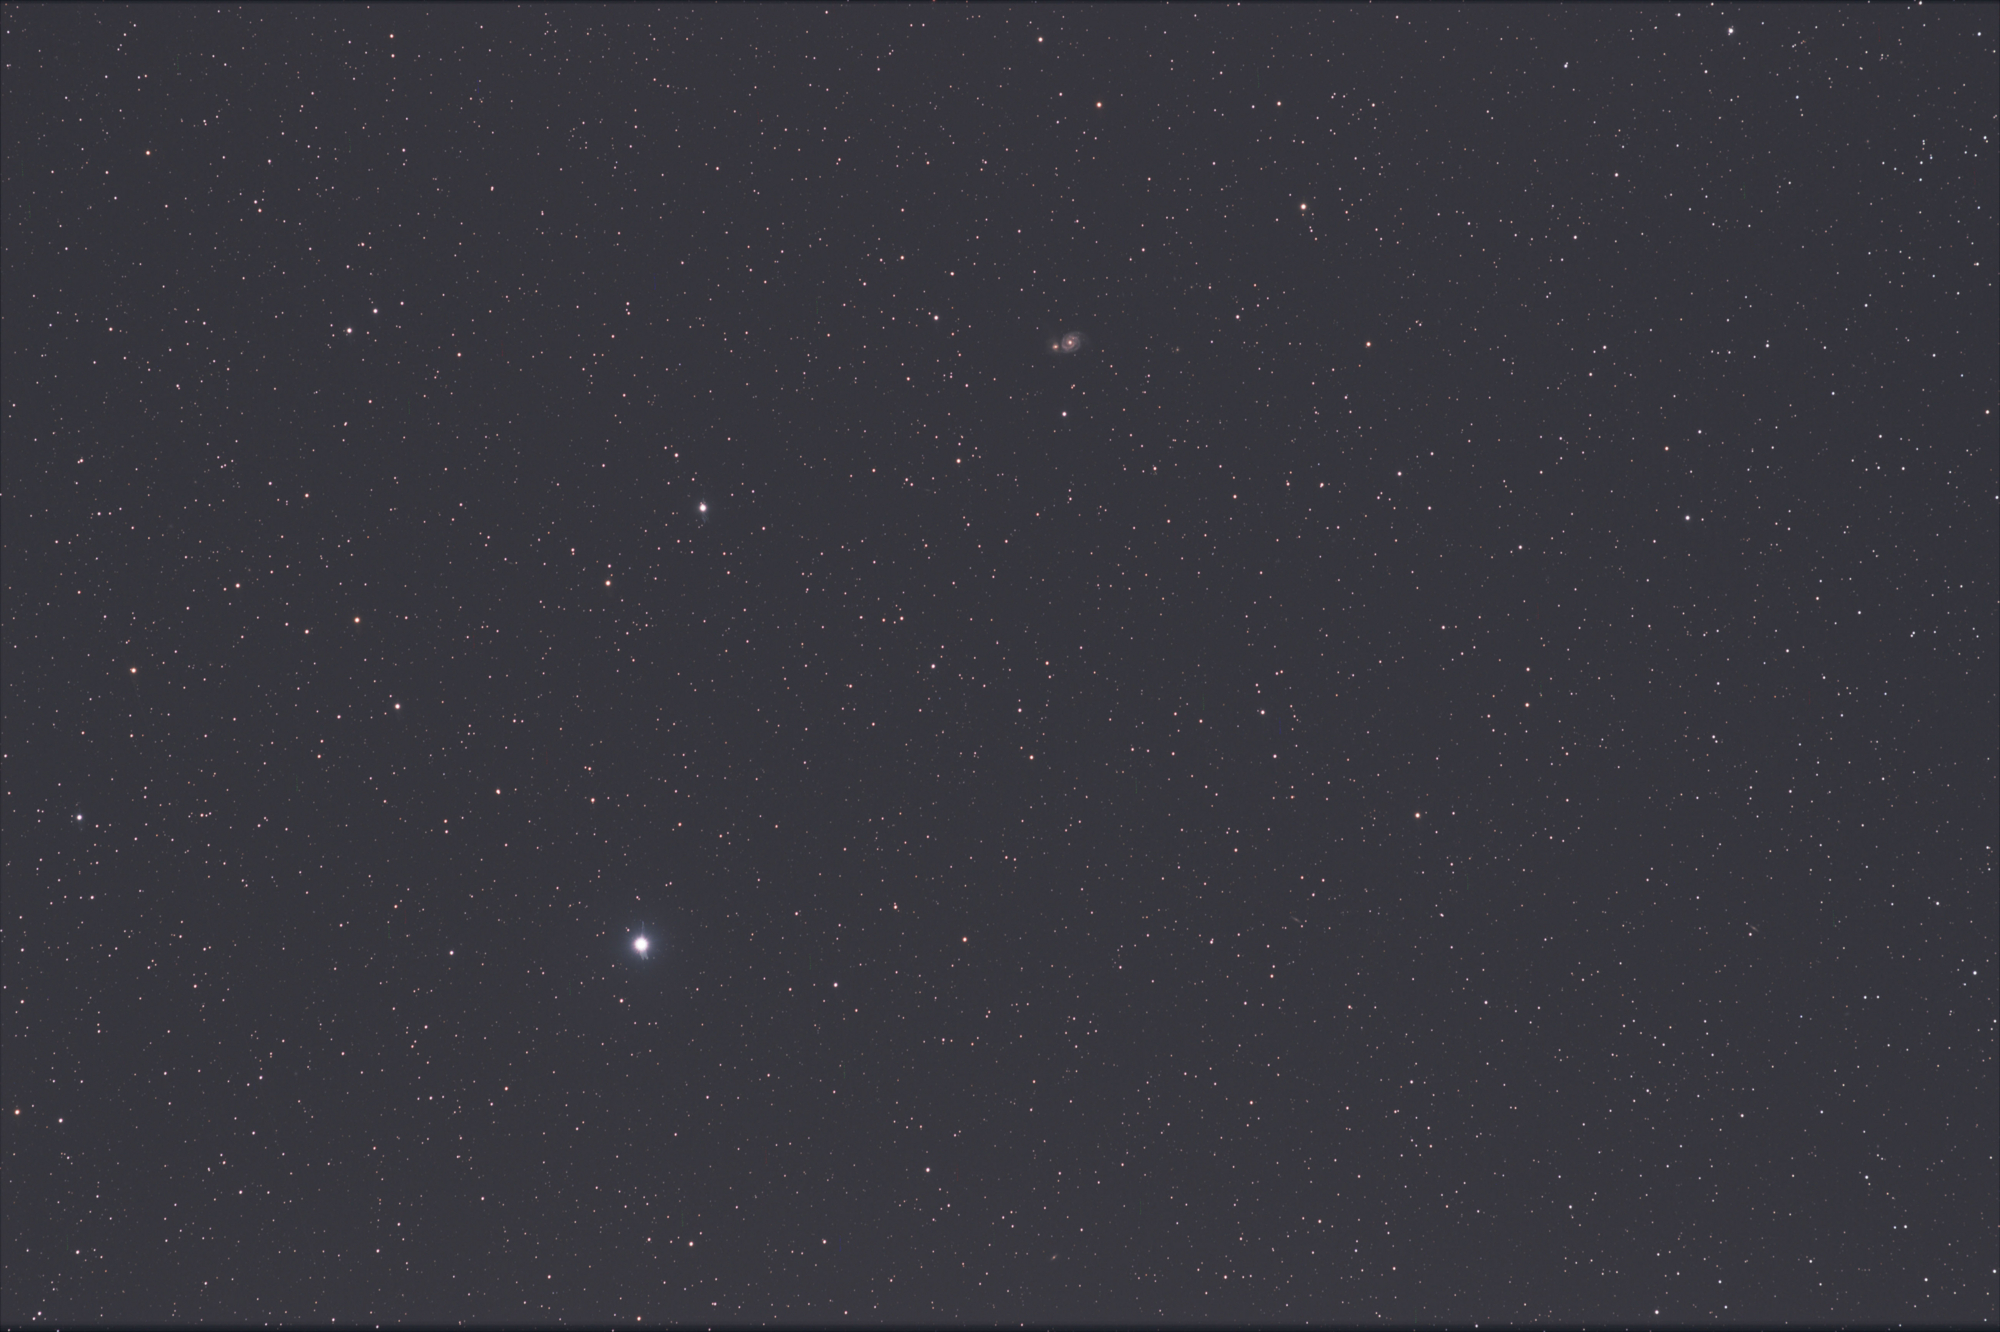 f:id:snct-astro:20180323171641j:plain